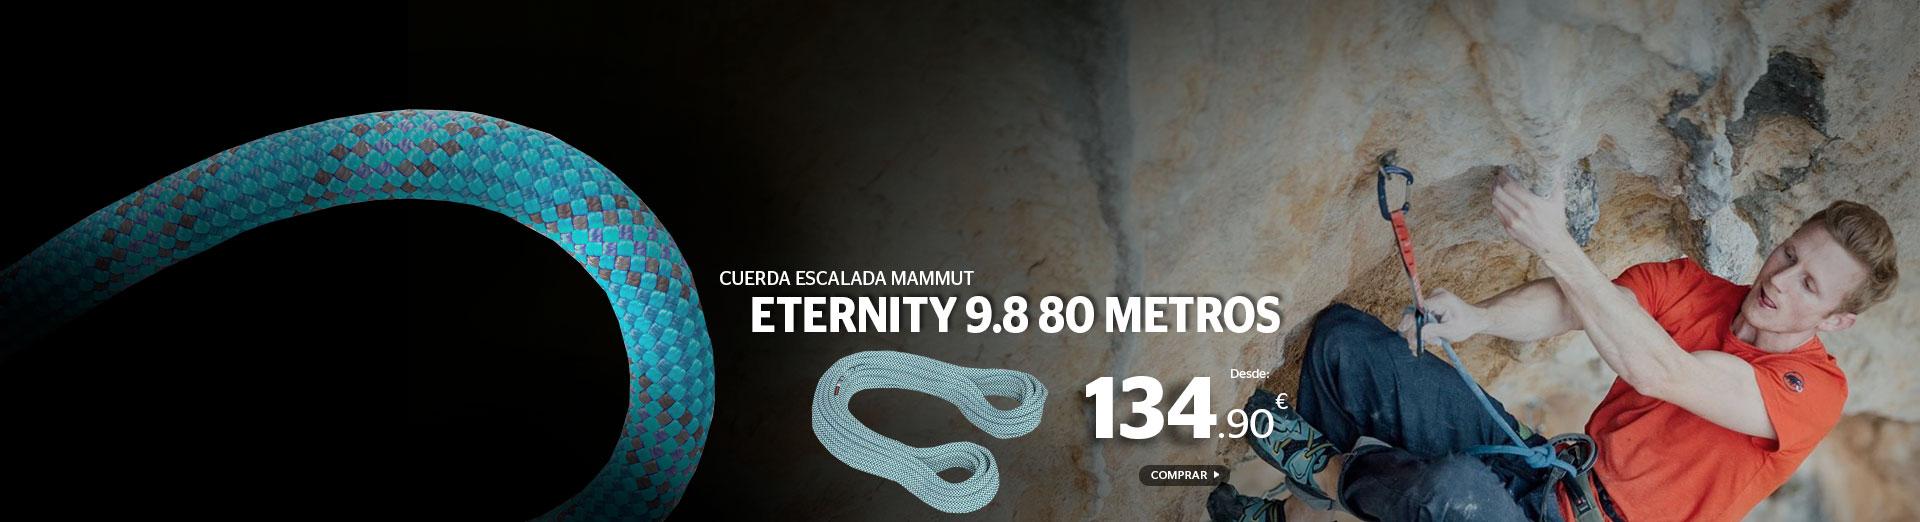 Cuerda Mammut Eternity 9.8 80 metros